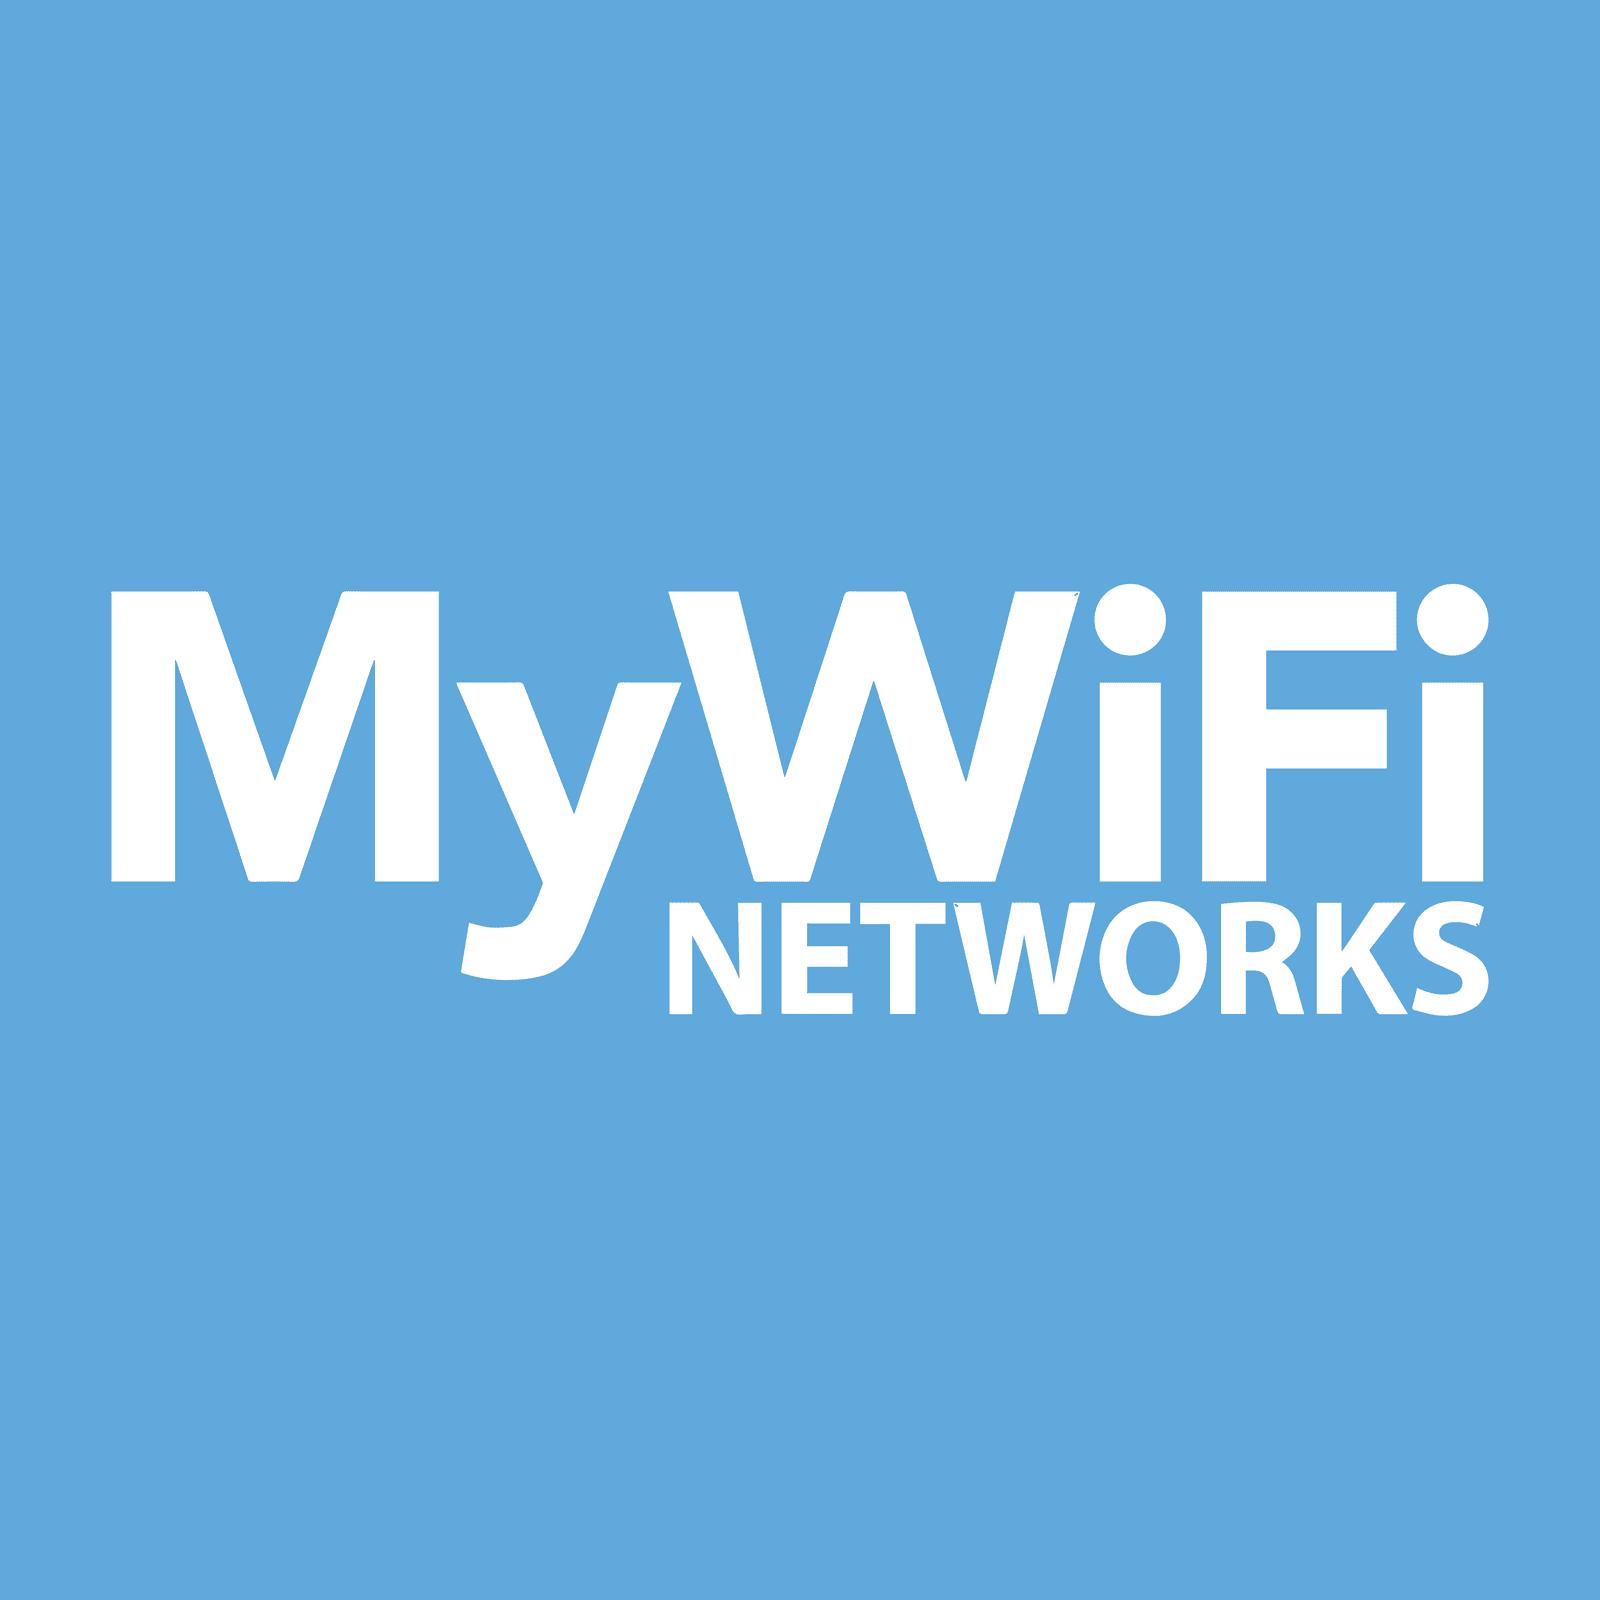 MyWiFi Networks | Crunchbase